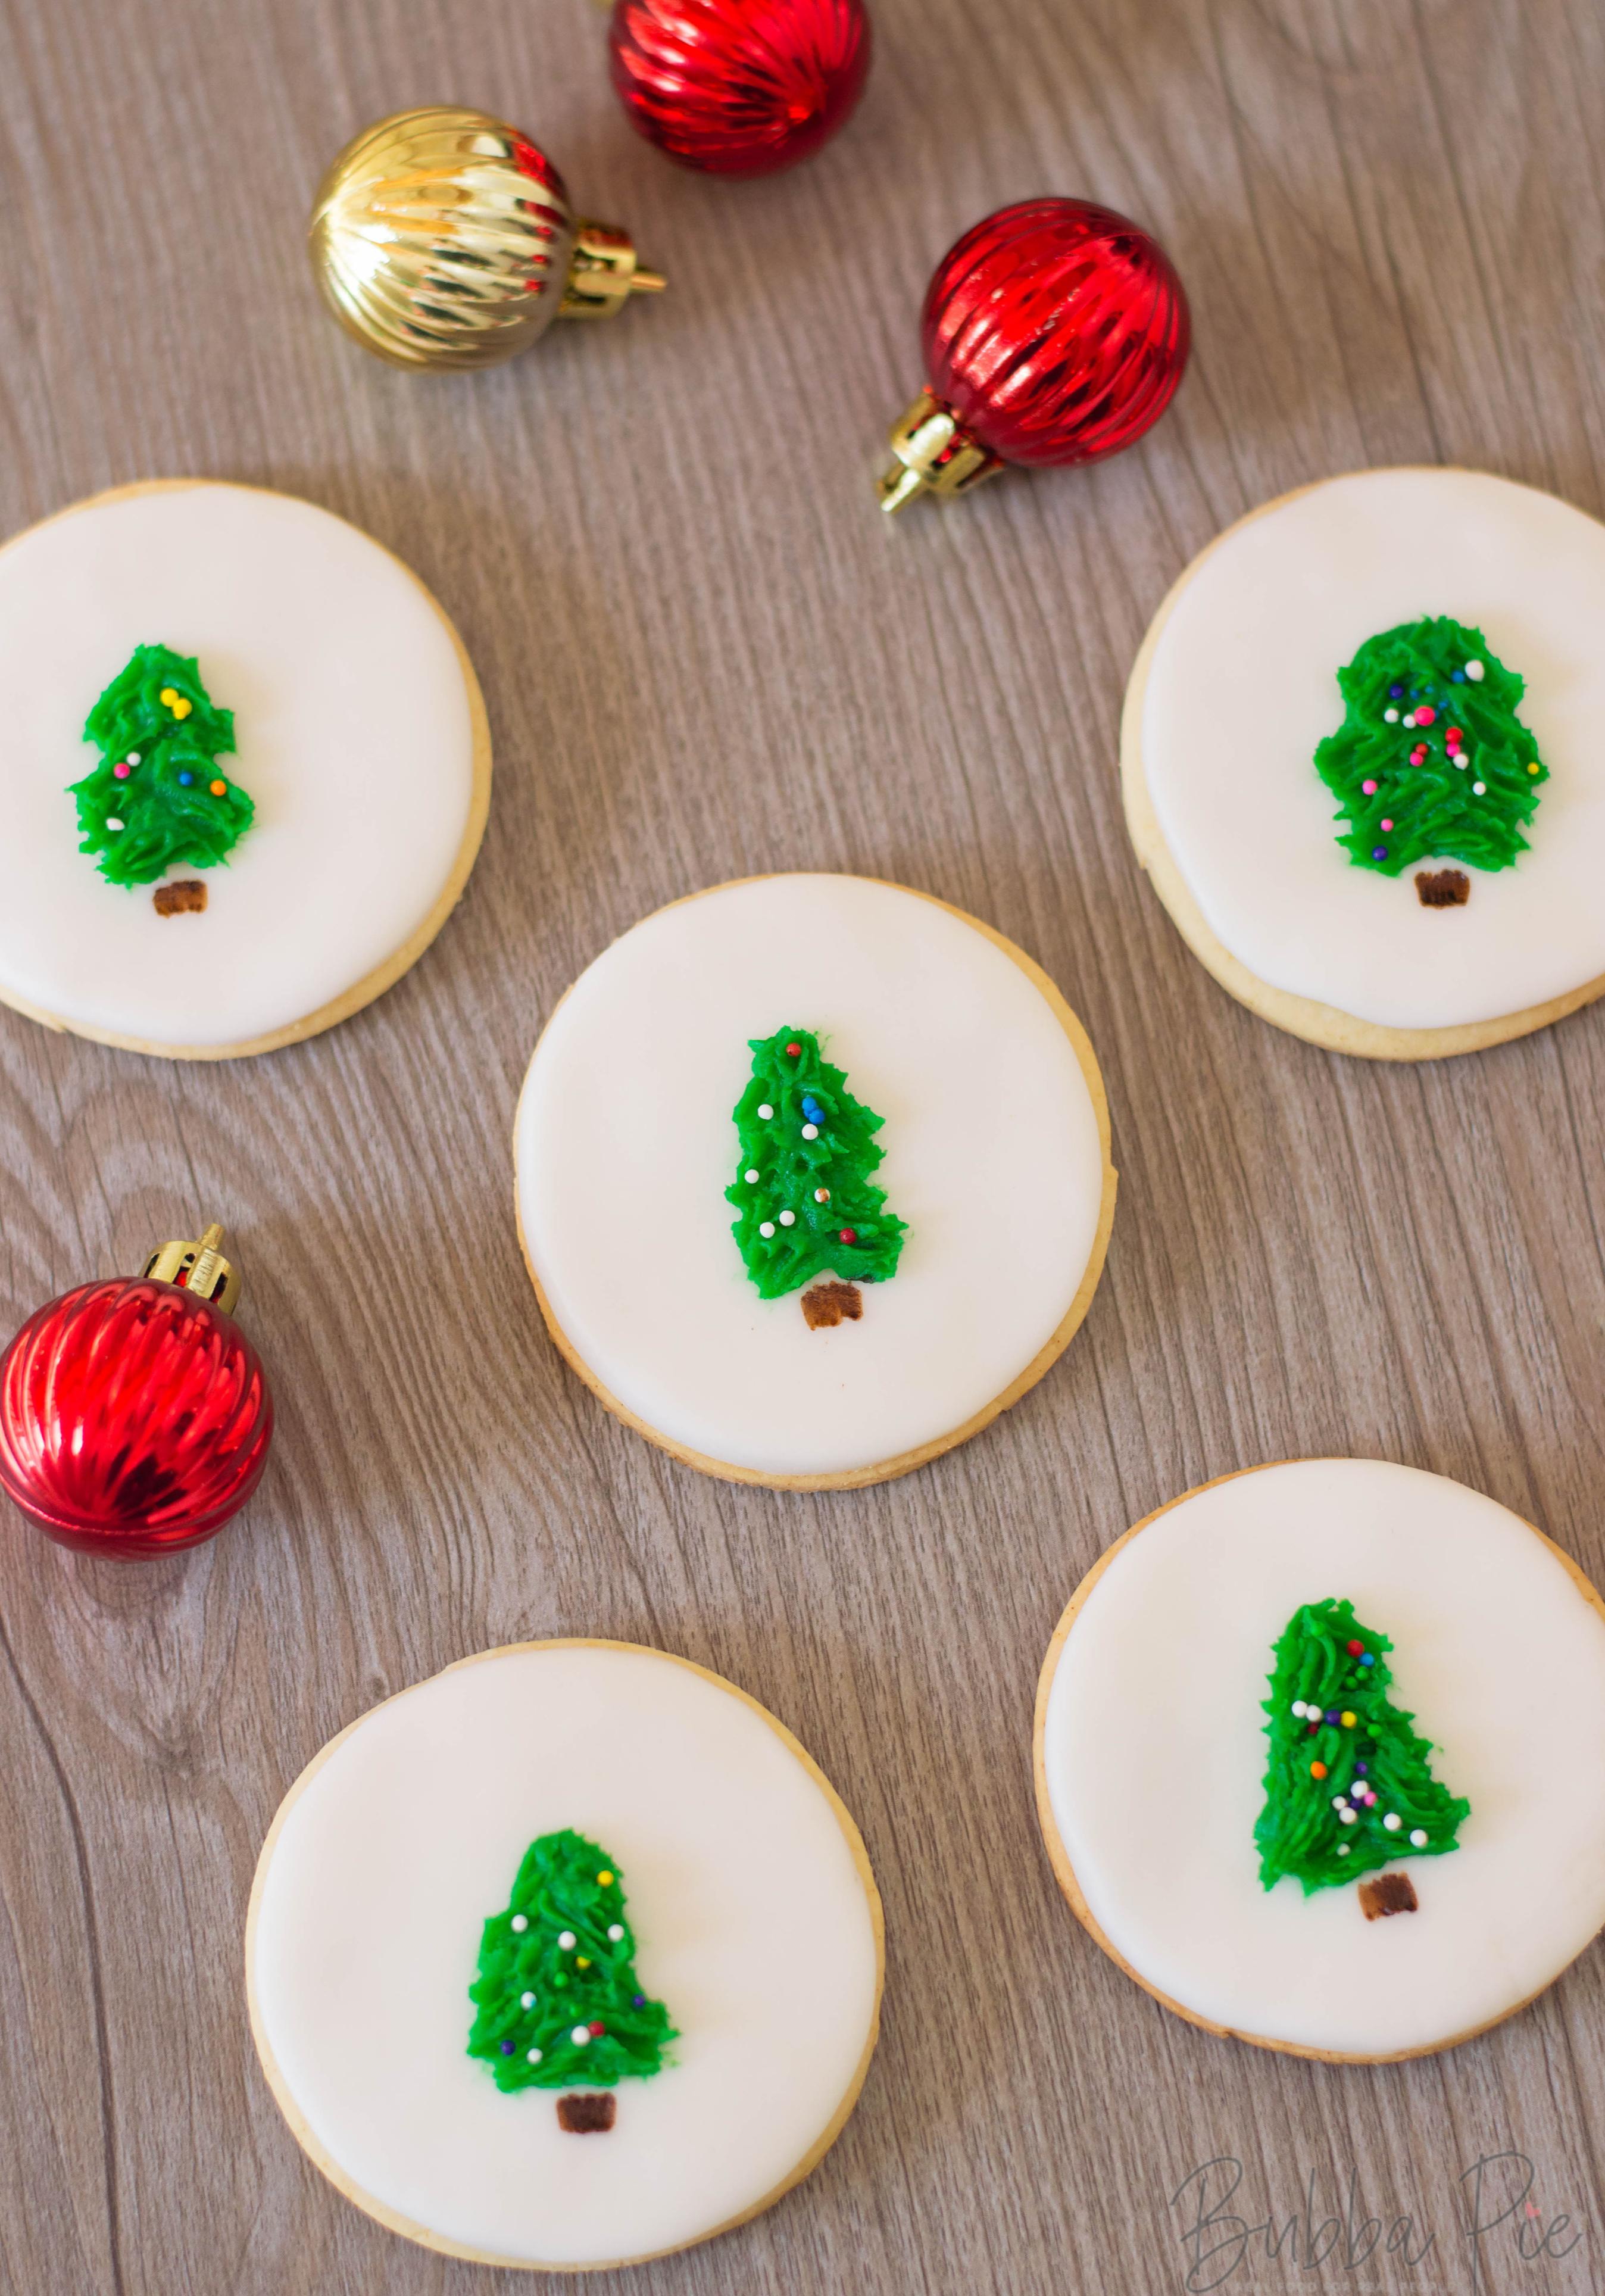 How to make Christmas Tree Sugar Cookies